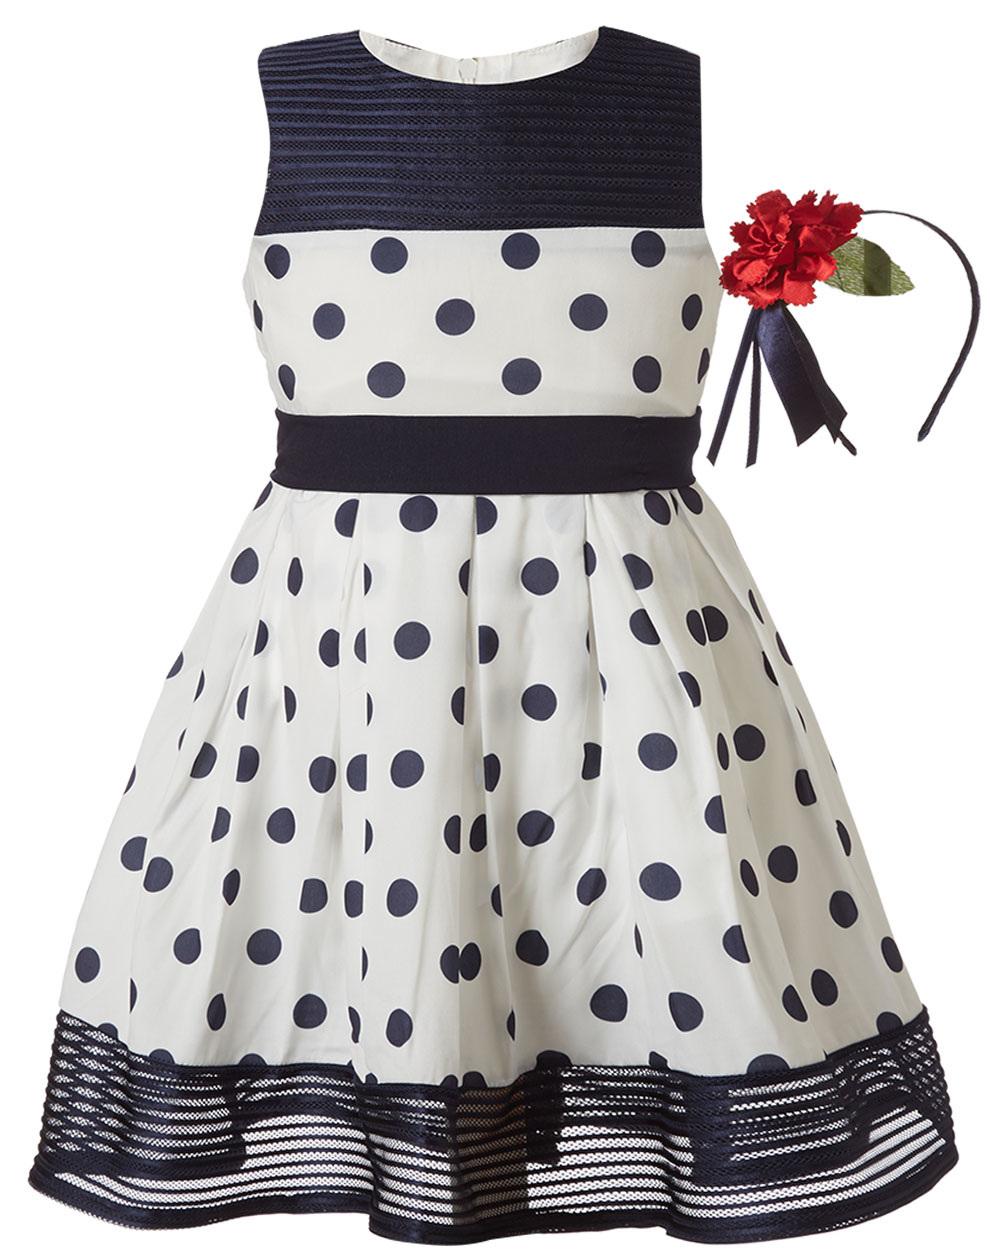 442bb9699d4 Pitsiriki Φόρεμα μουσελίνα πουά και στέκα μαλλιών 46-219274-7 - ΠΟΥΑ -  14023-